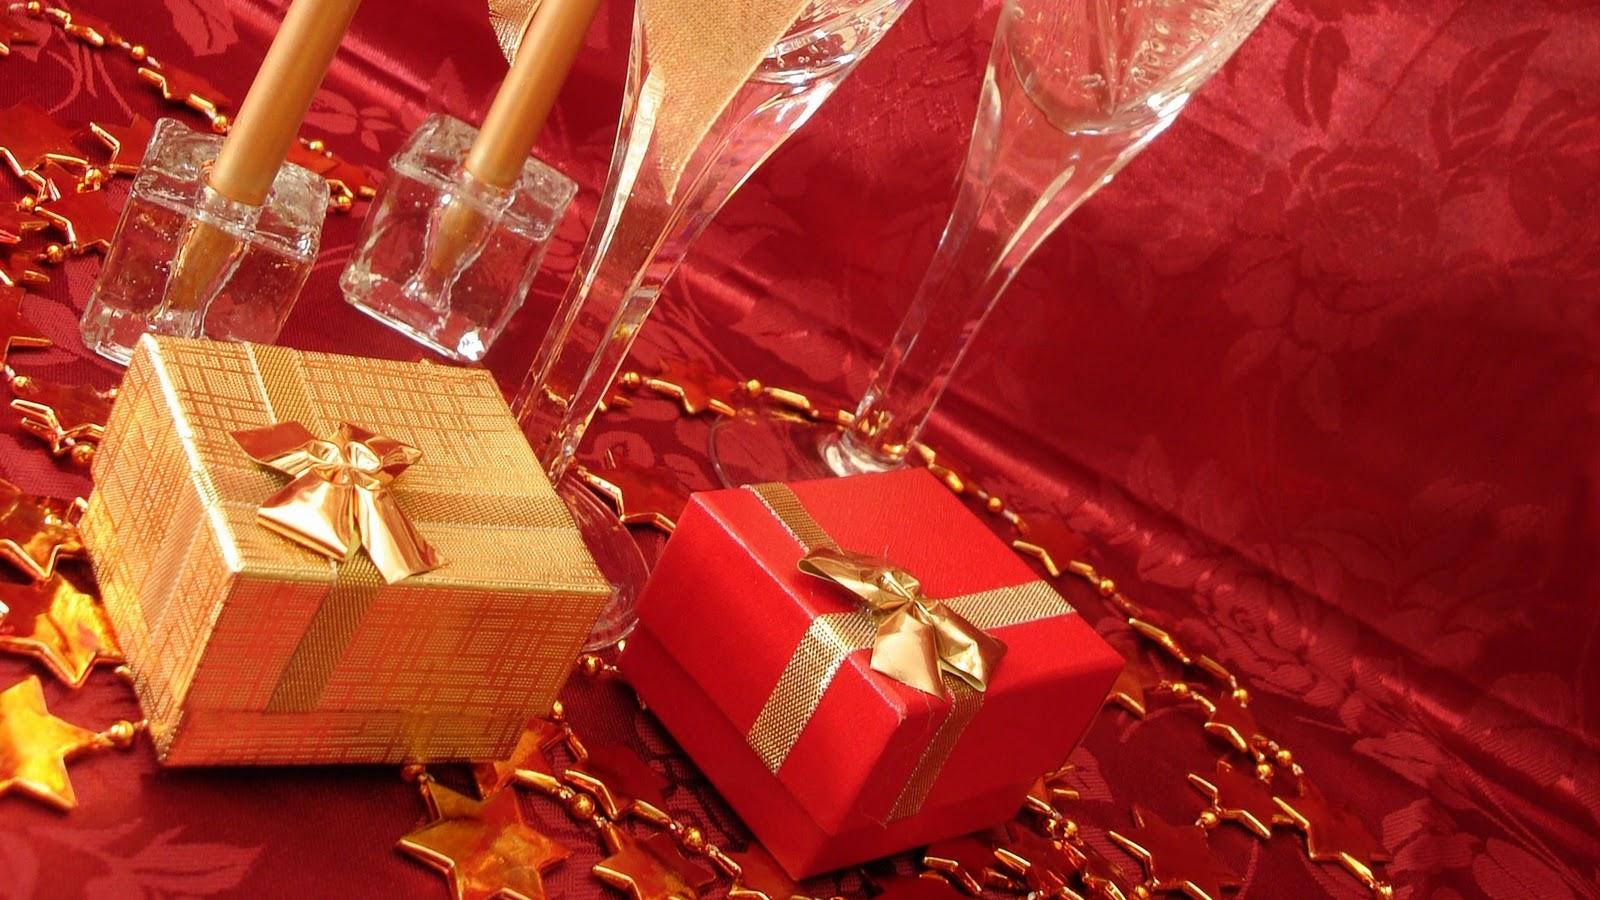 daily rambler Download 2011 Christmas Greeting Cards Christmas 1600x900